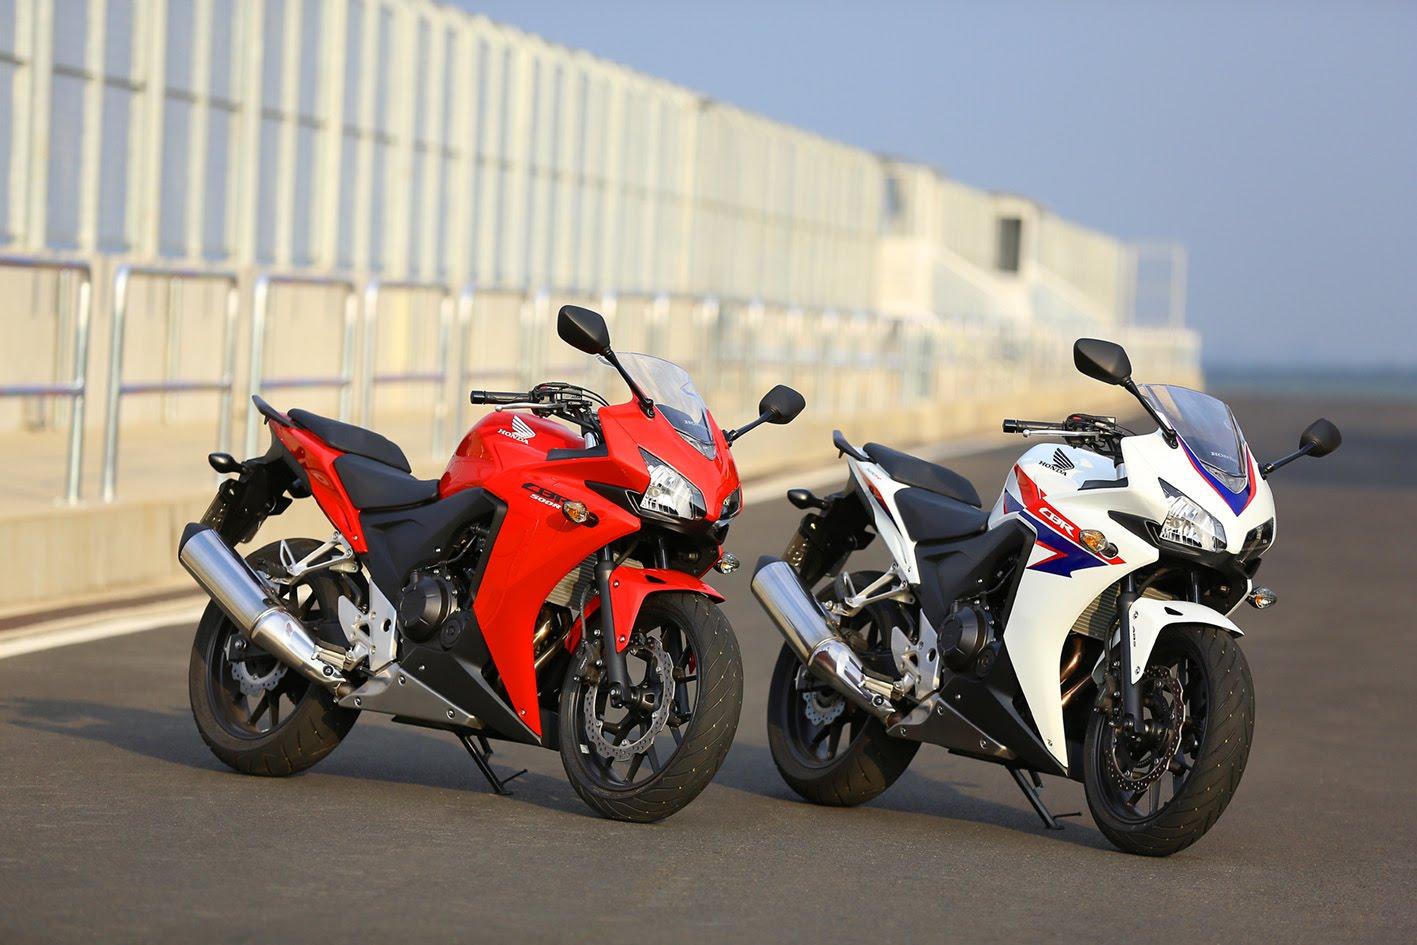 Upcoming Honda Bikes In India 2016